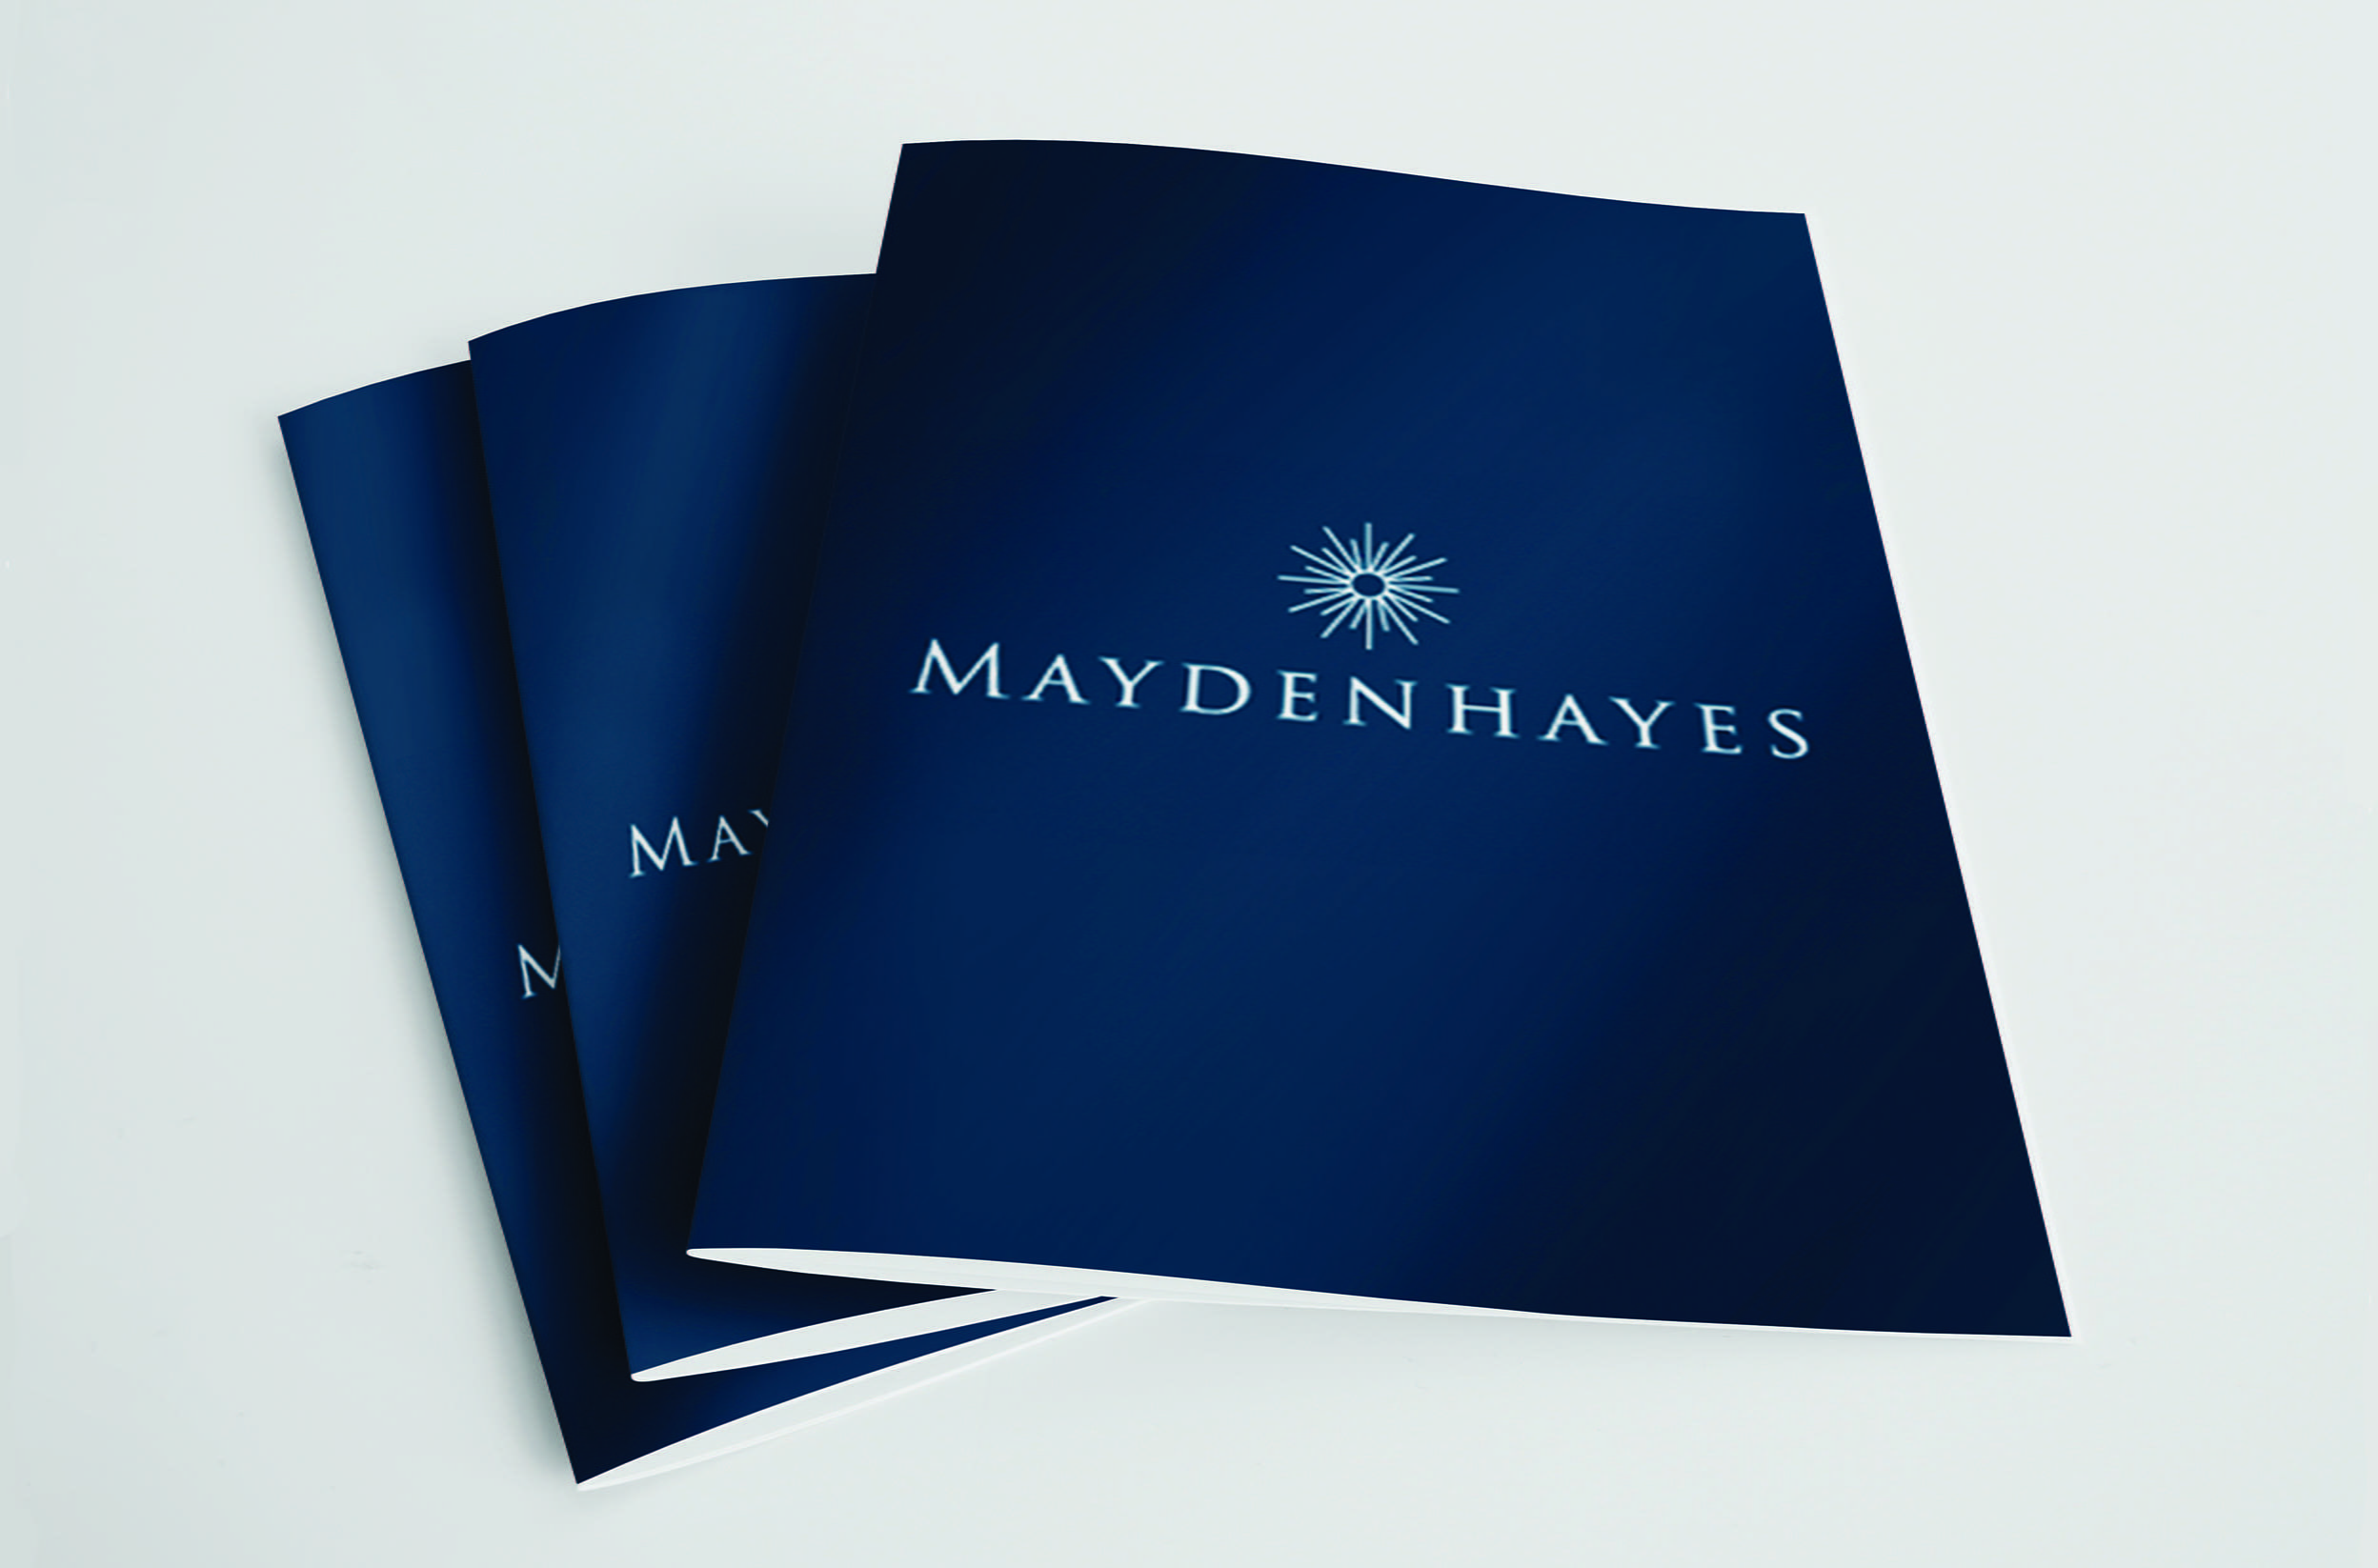 maydenhayes-4-1